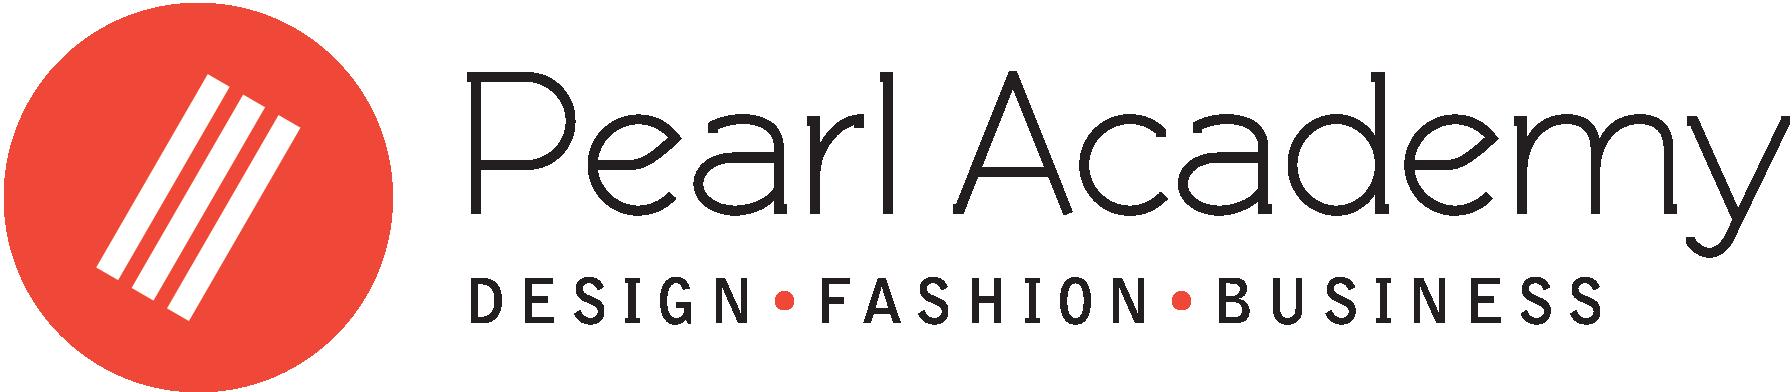 Pearl Academy Delhi Admission 2018